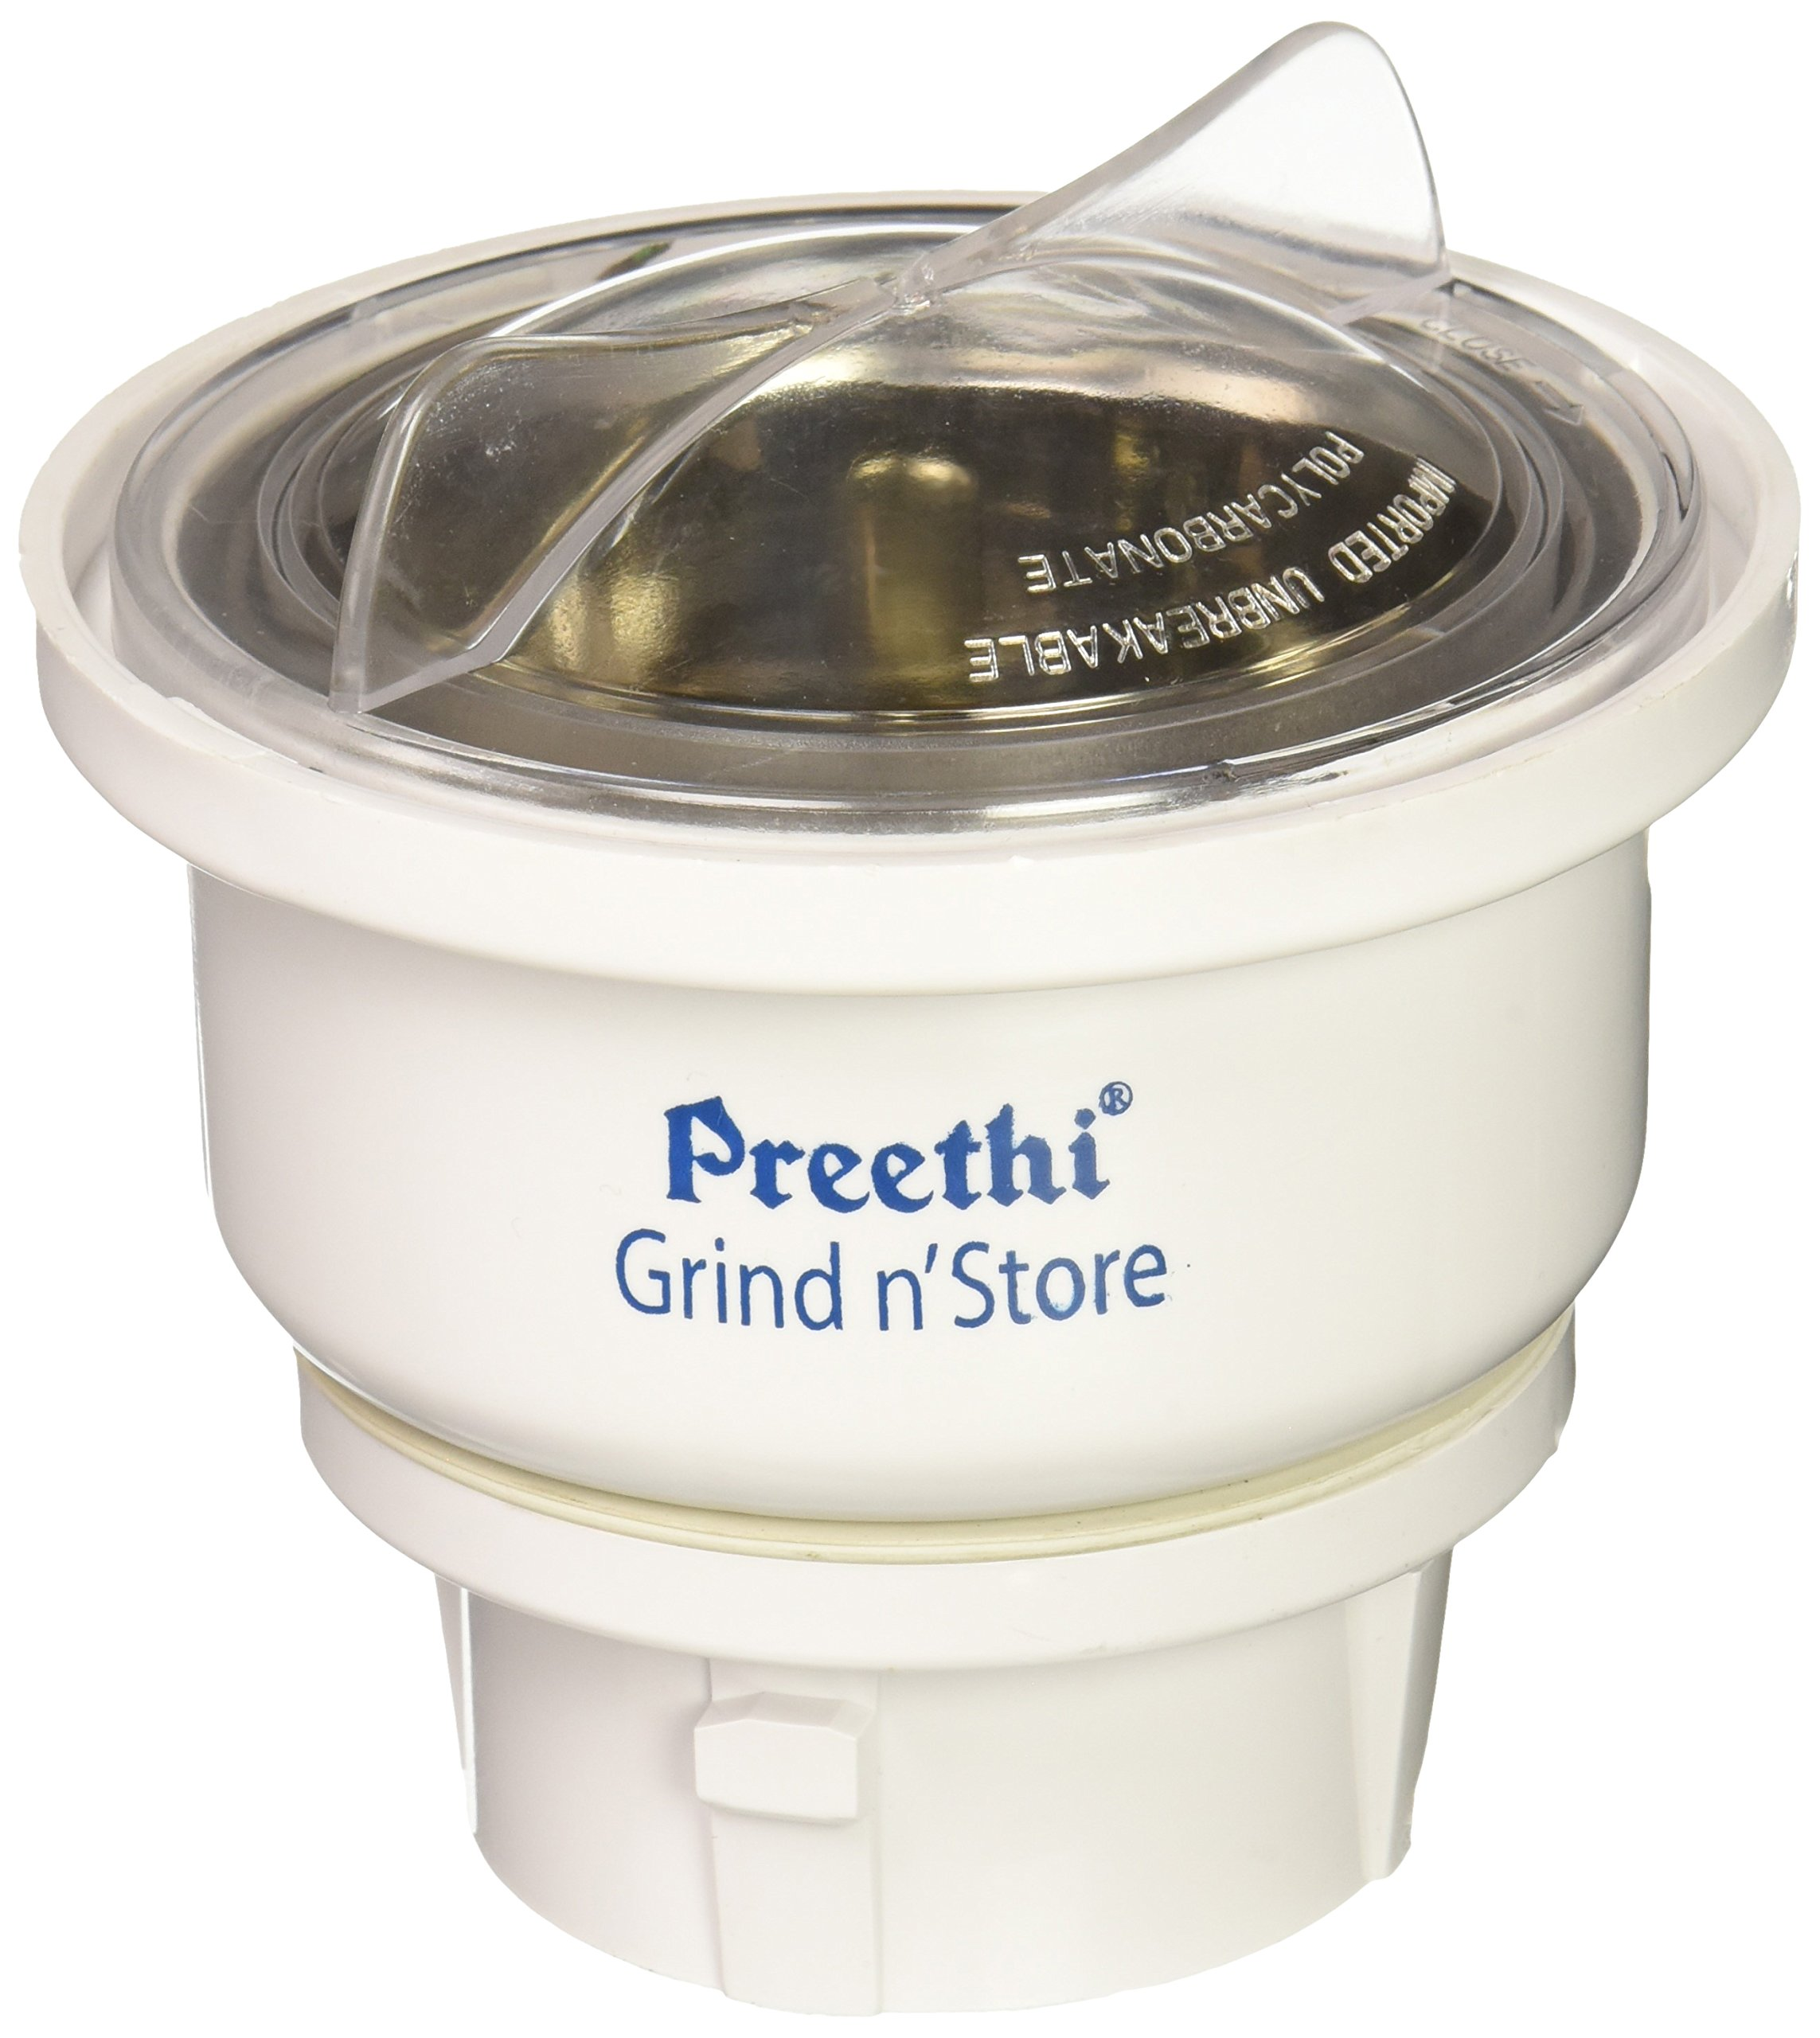 Preethi 0.4-Liter Grind n' Store Blue Leaf Chutney Jar